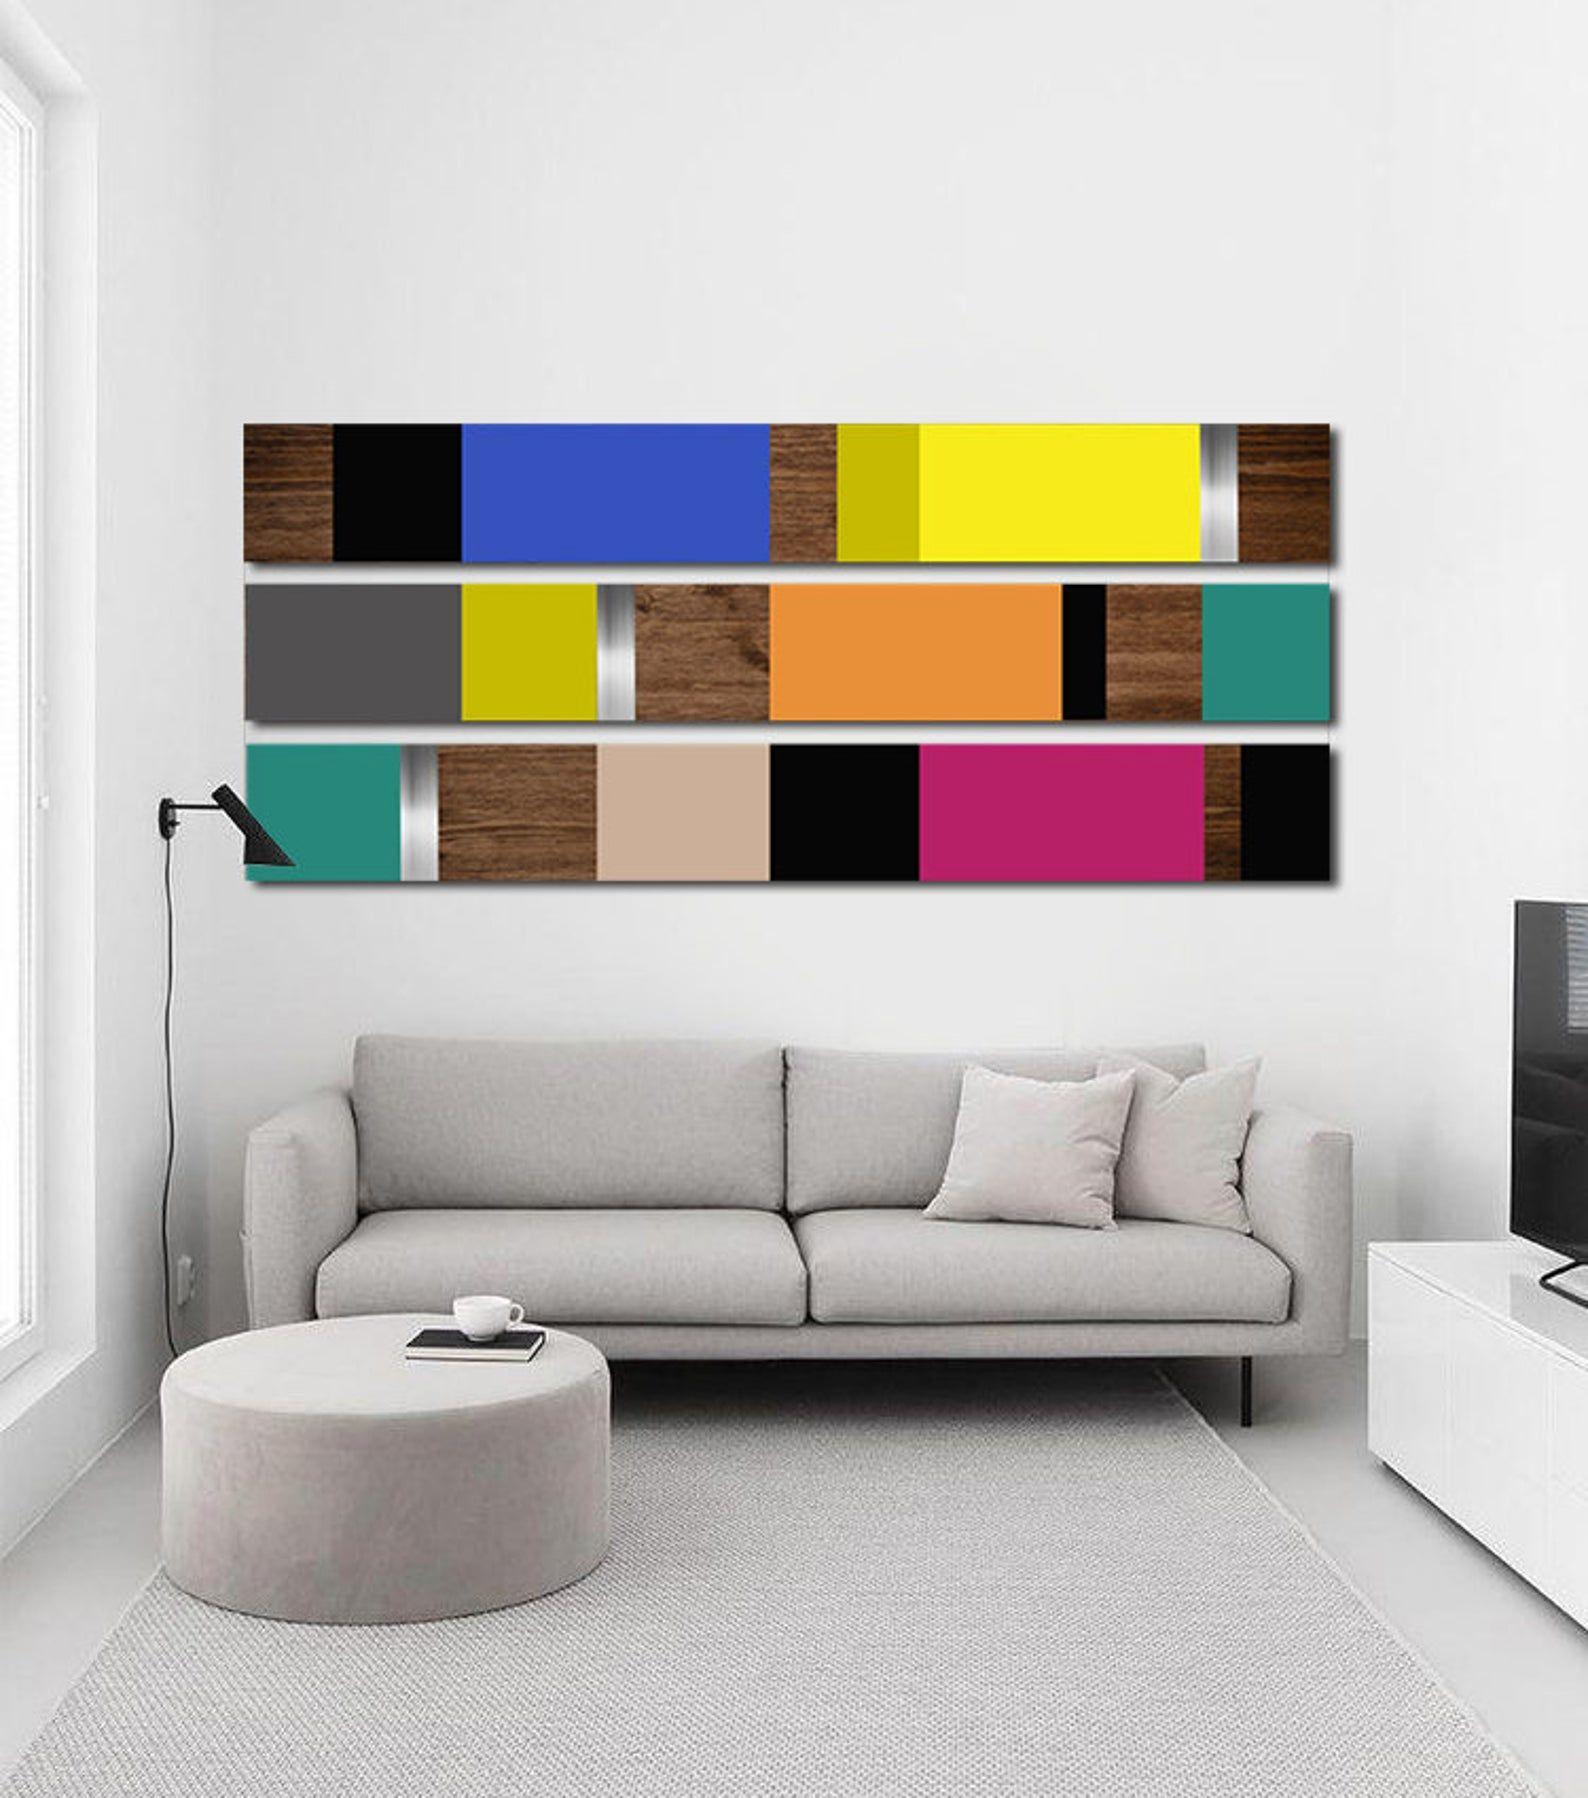 Minimalist Large Art Wall Decor Mid Century Modern Metal Etsy In 2020 Wood Wall Art Wood Art Design Wall Art Decor